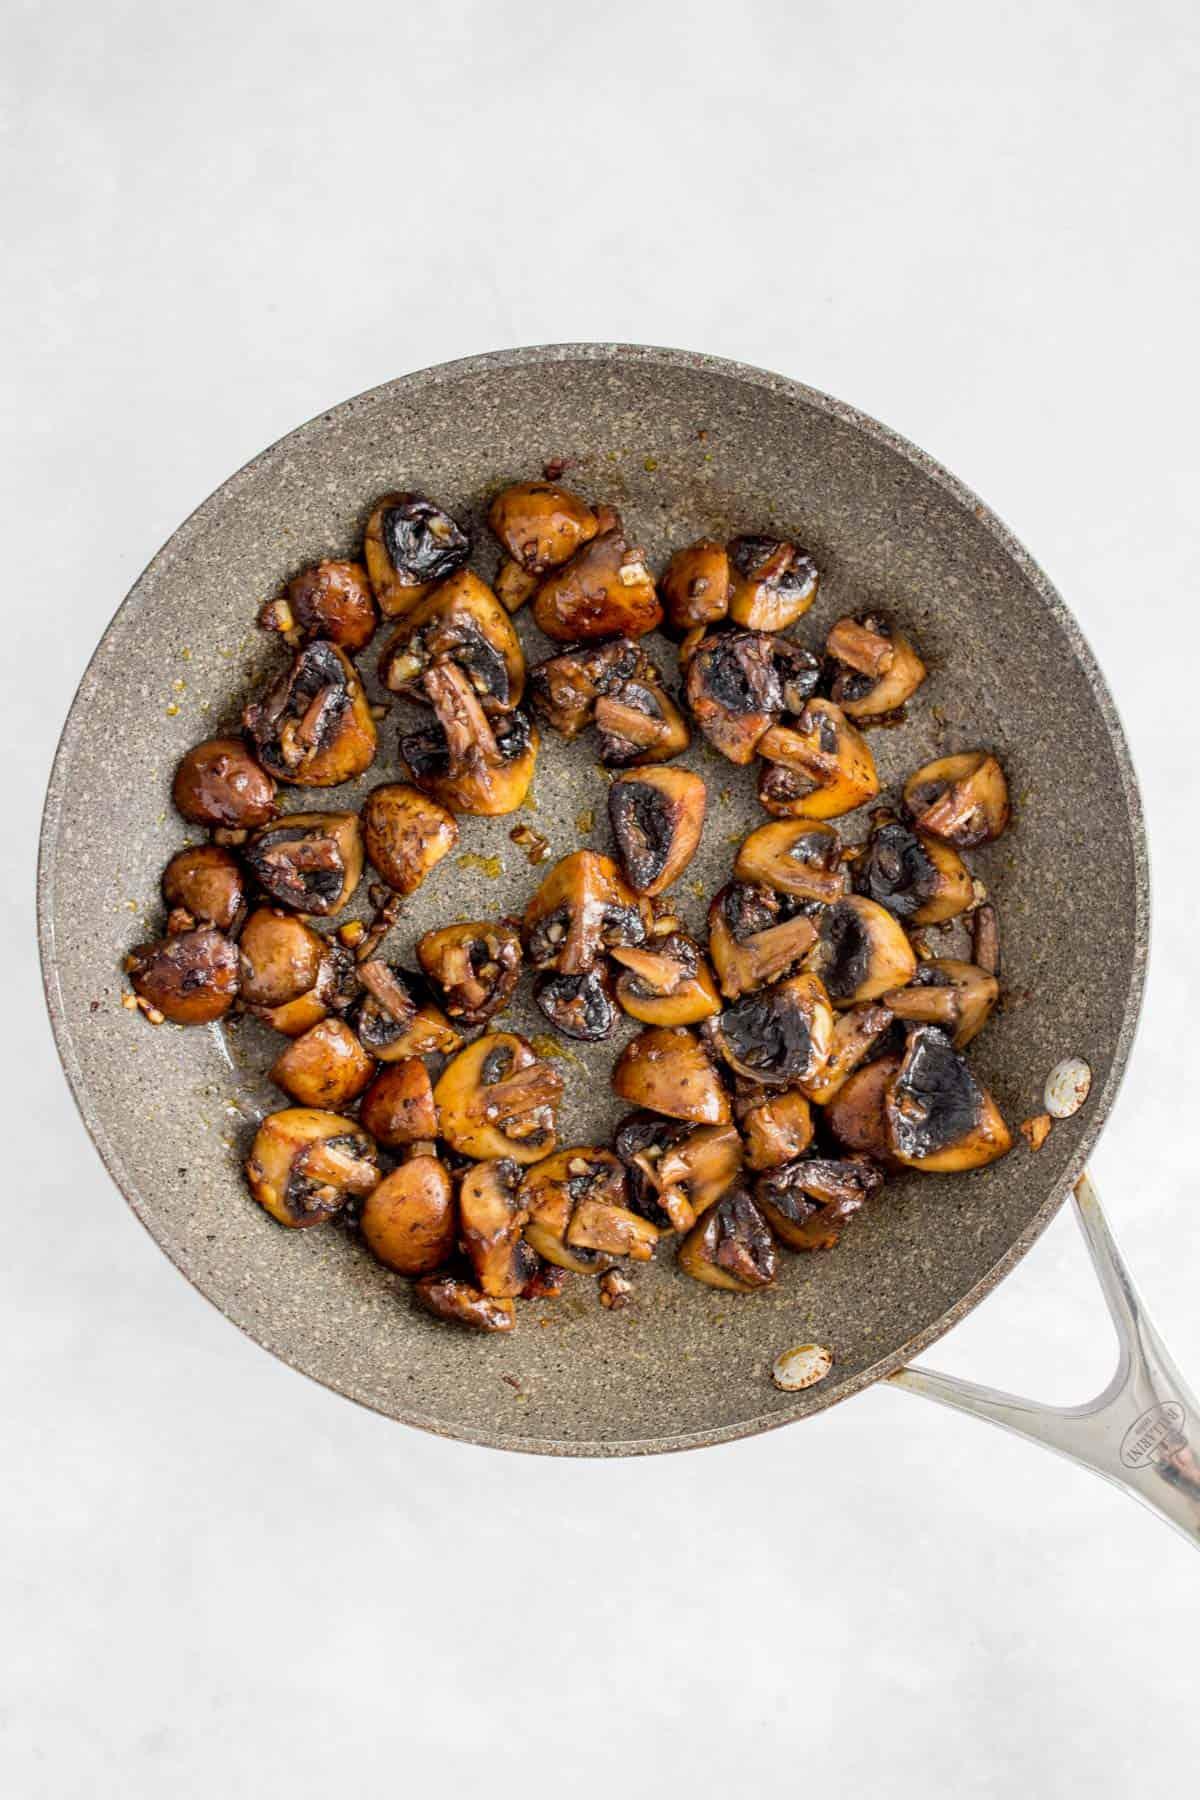 Garlic mushrooms in a pan.